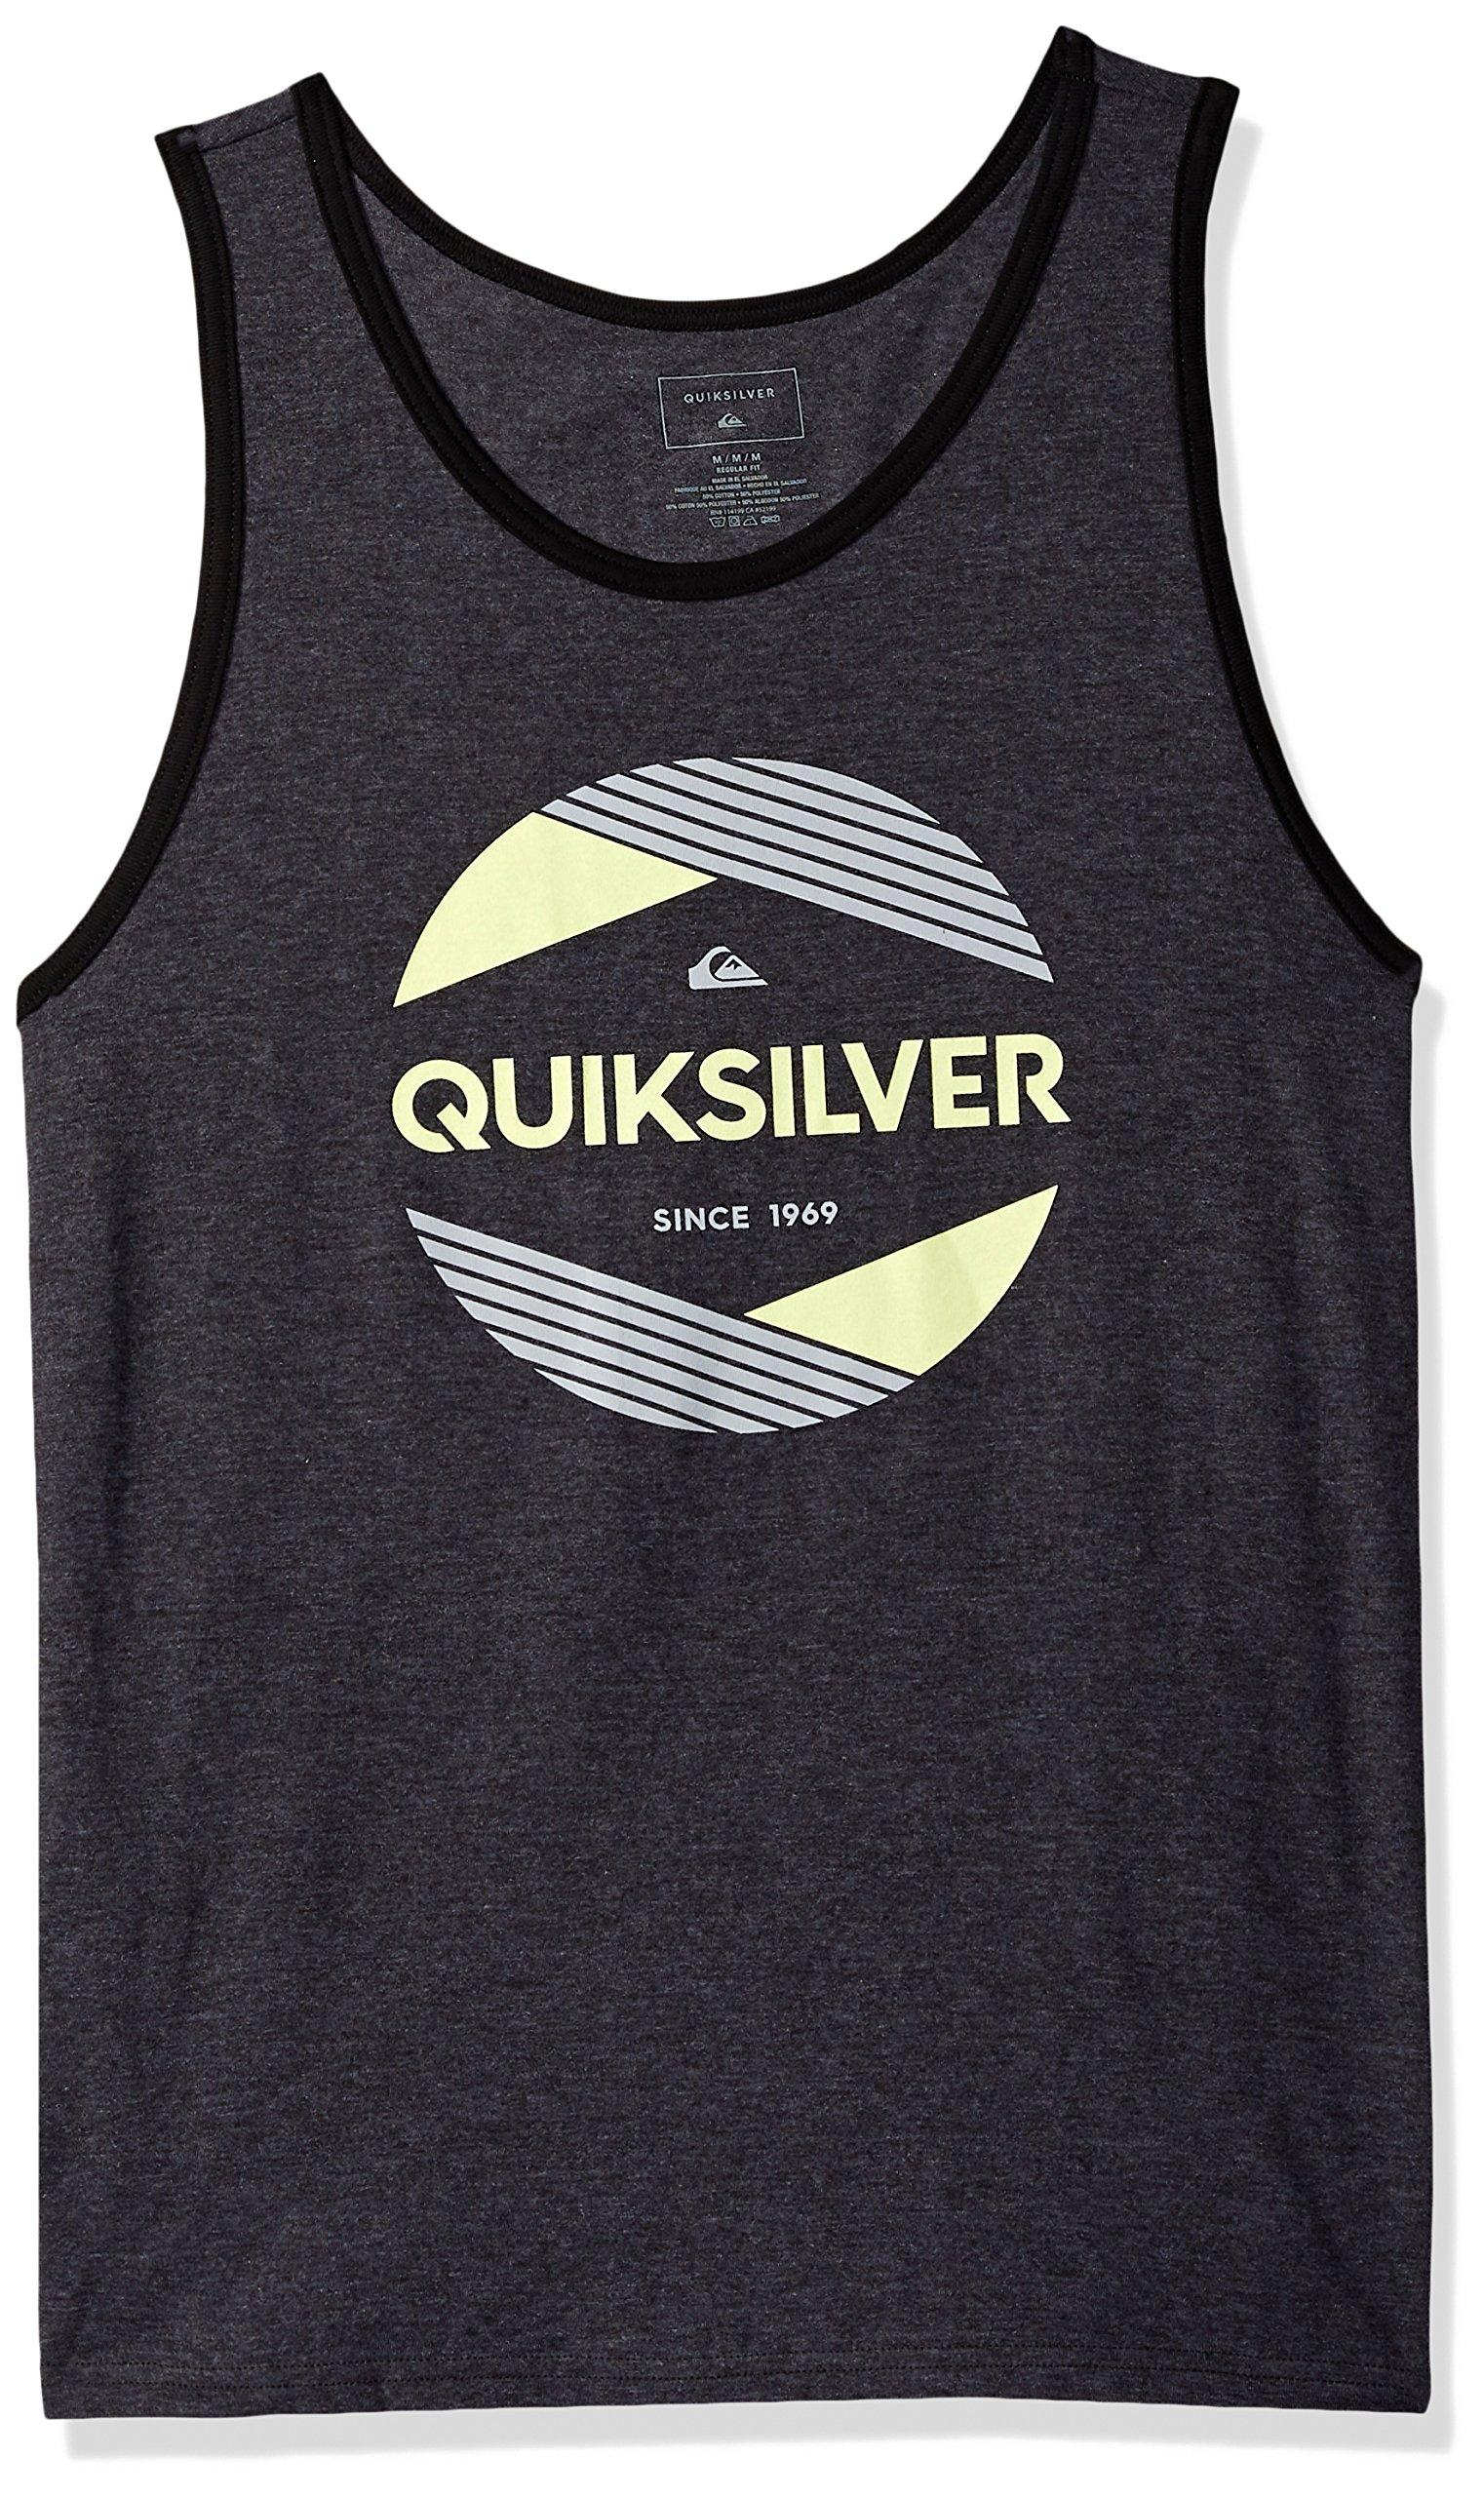 Quiksilver Men's Logo Tank Top Tee Shirt, a Cut Above Charcoal Heather, M